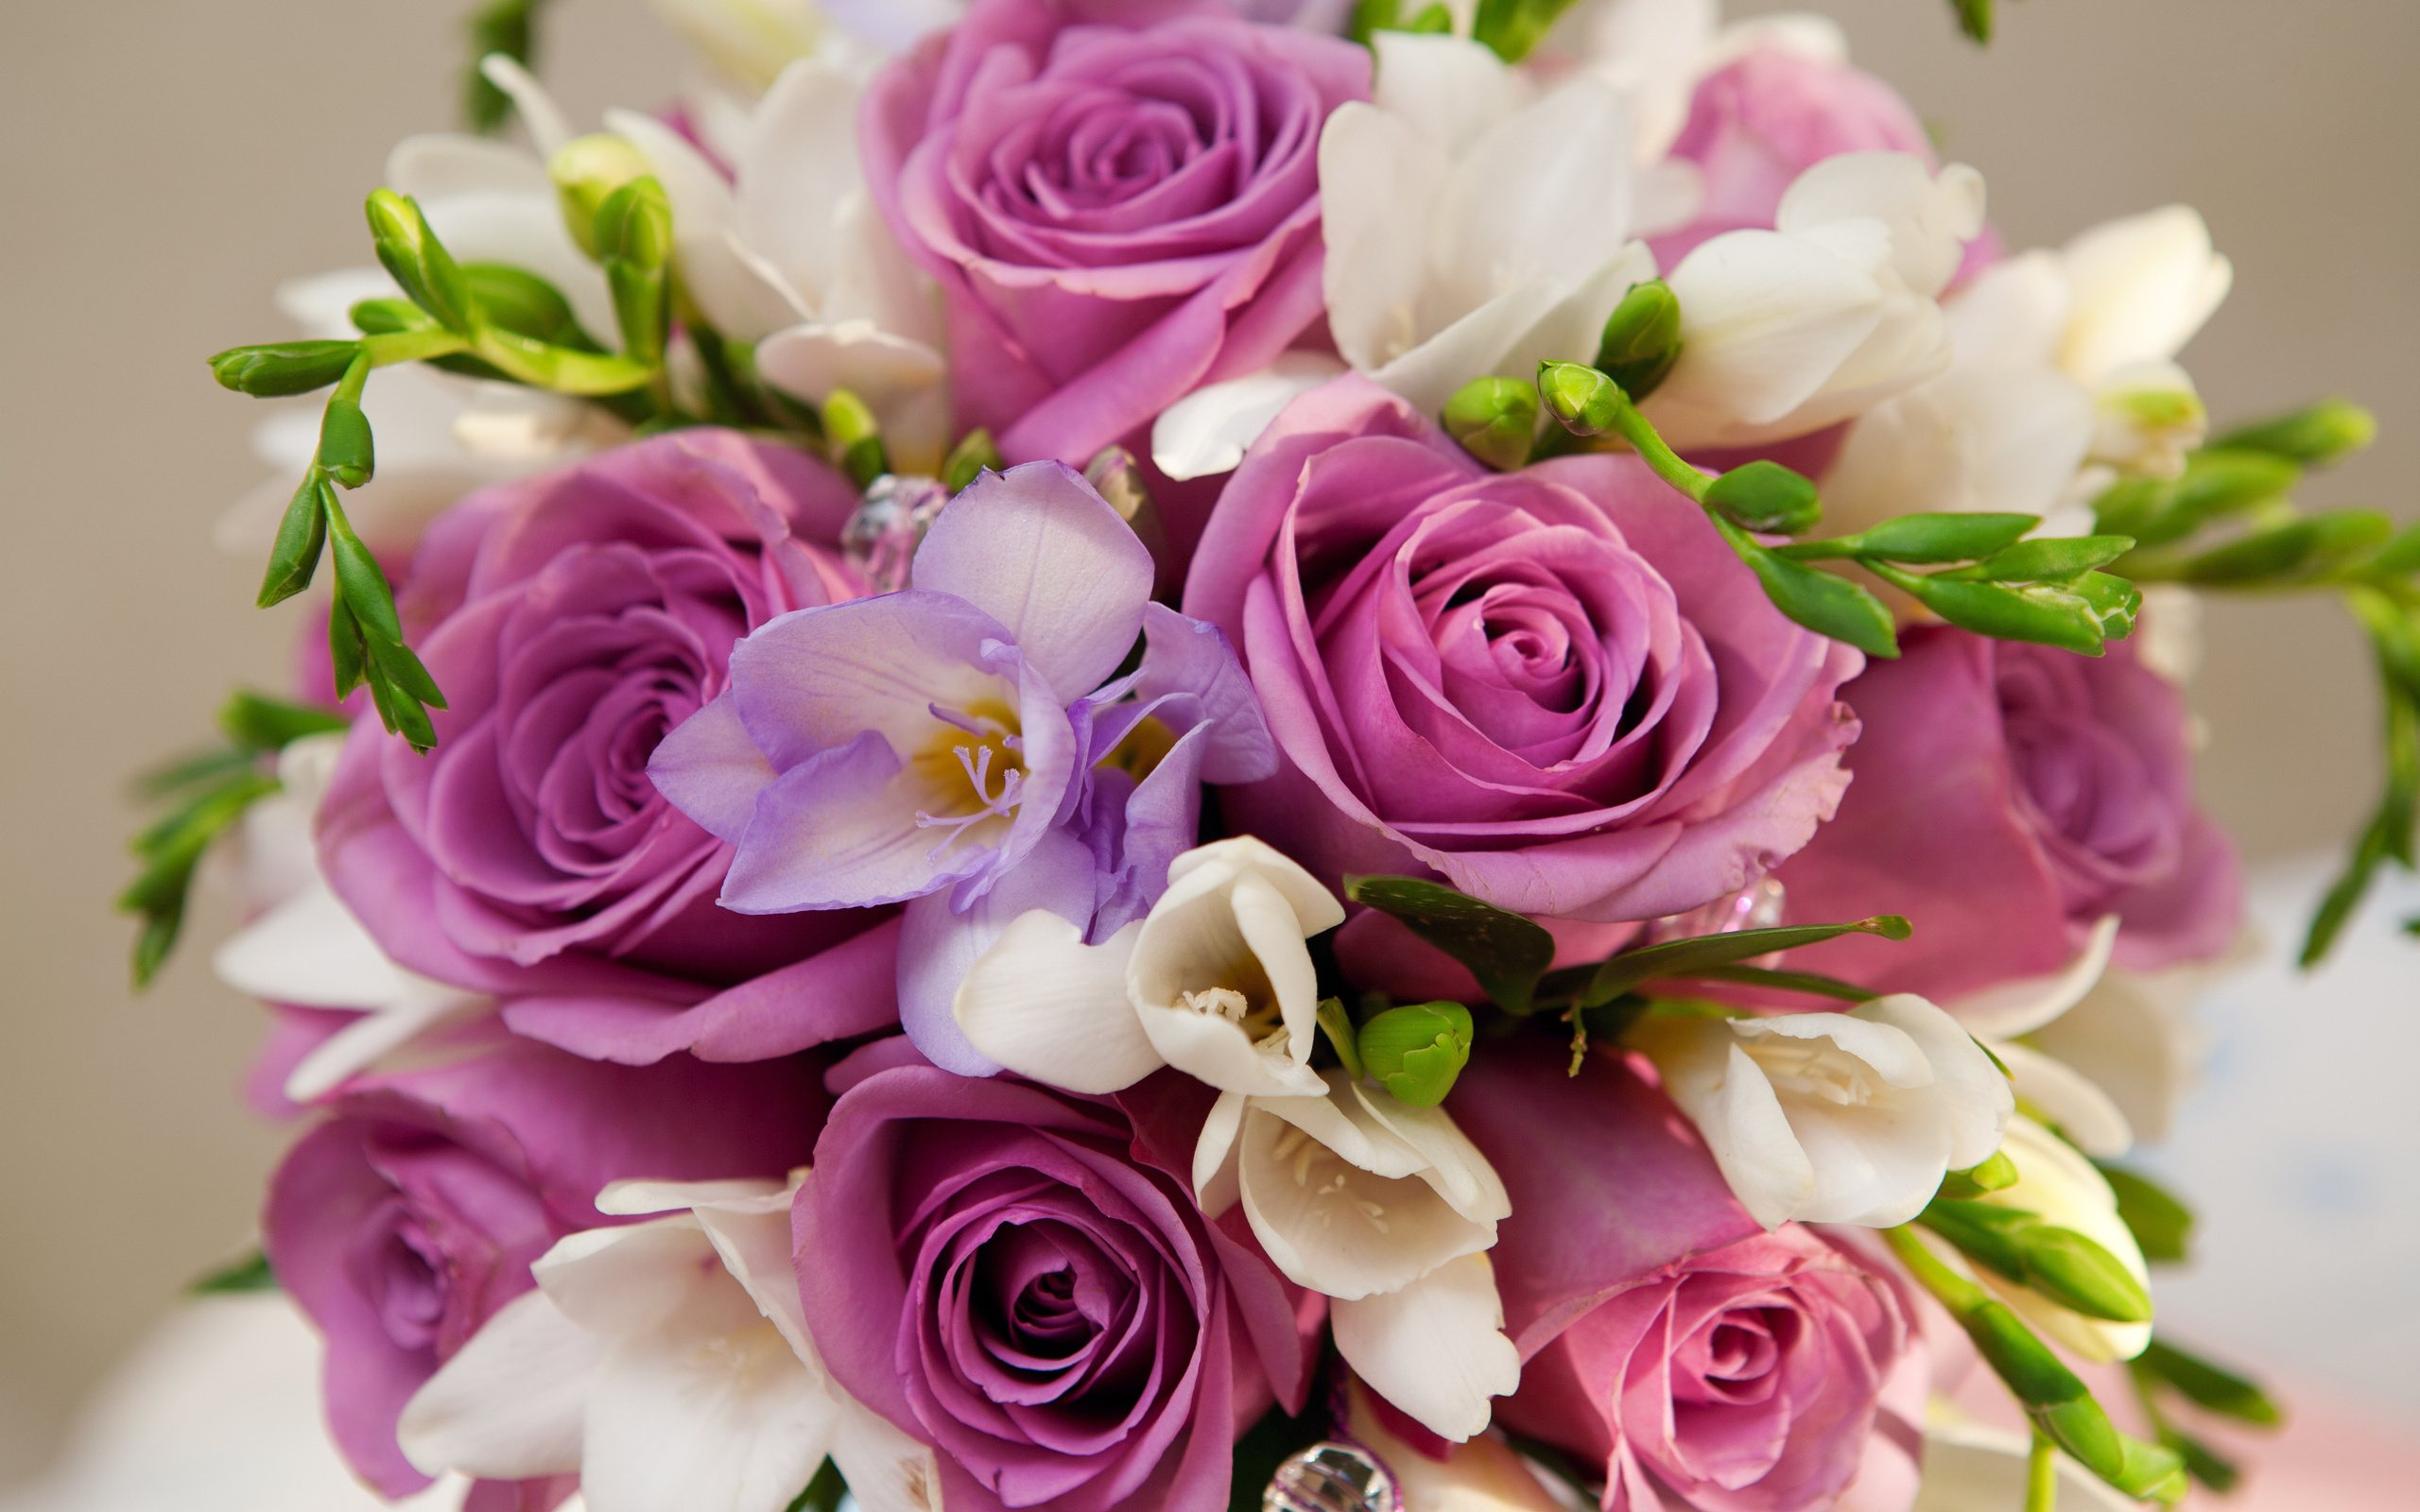 بالصور صور ورد جميل , اجمل صور لبوكيه الورد 4327 6